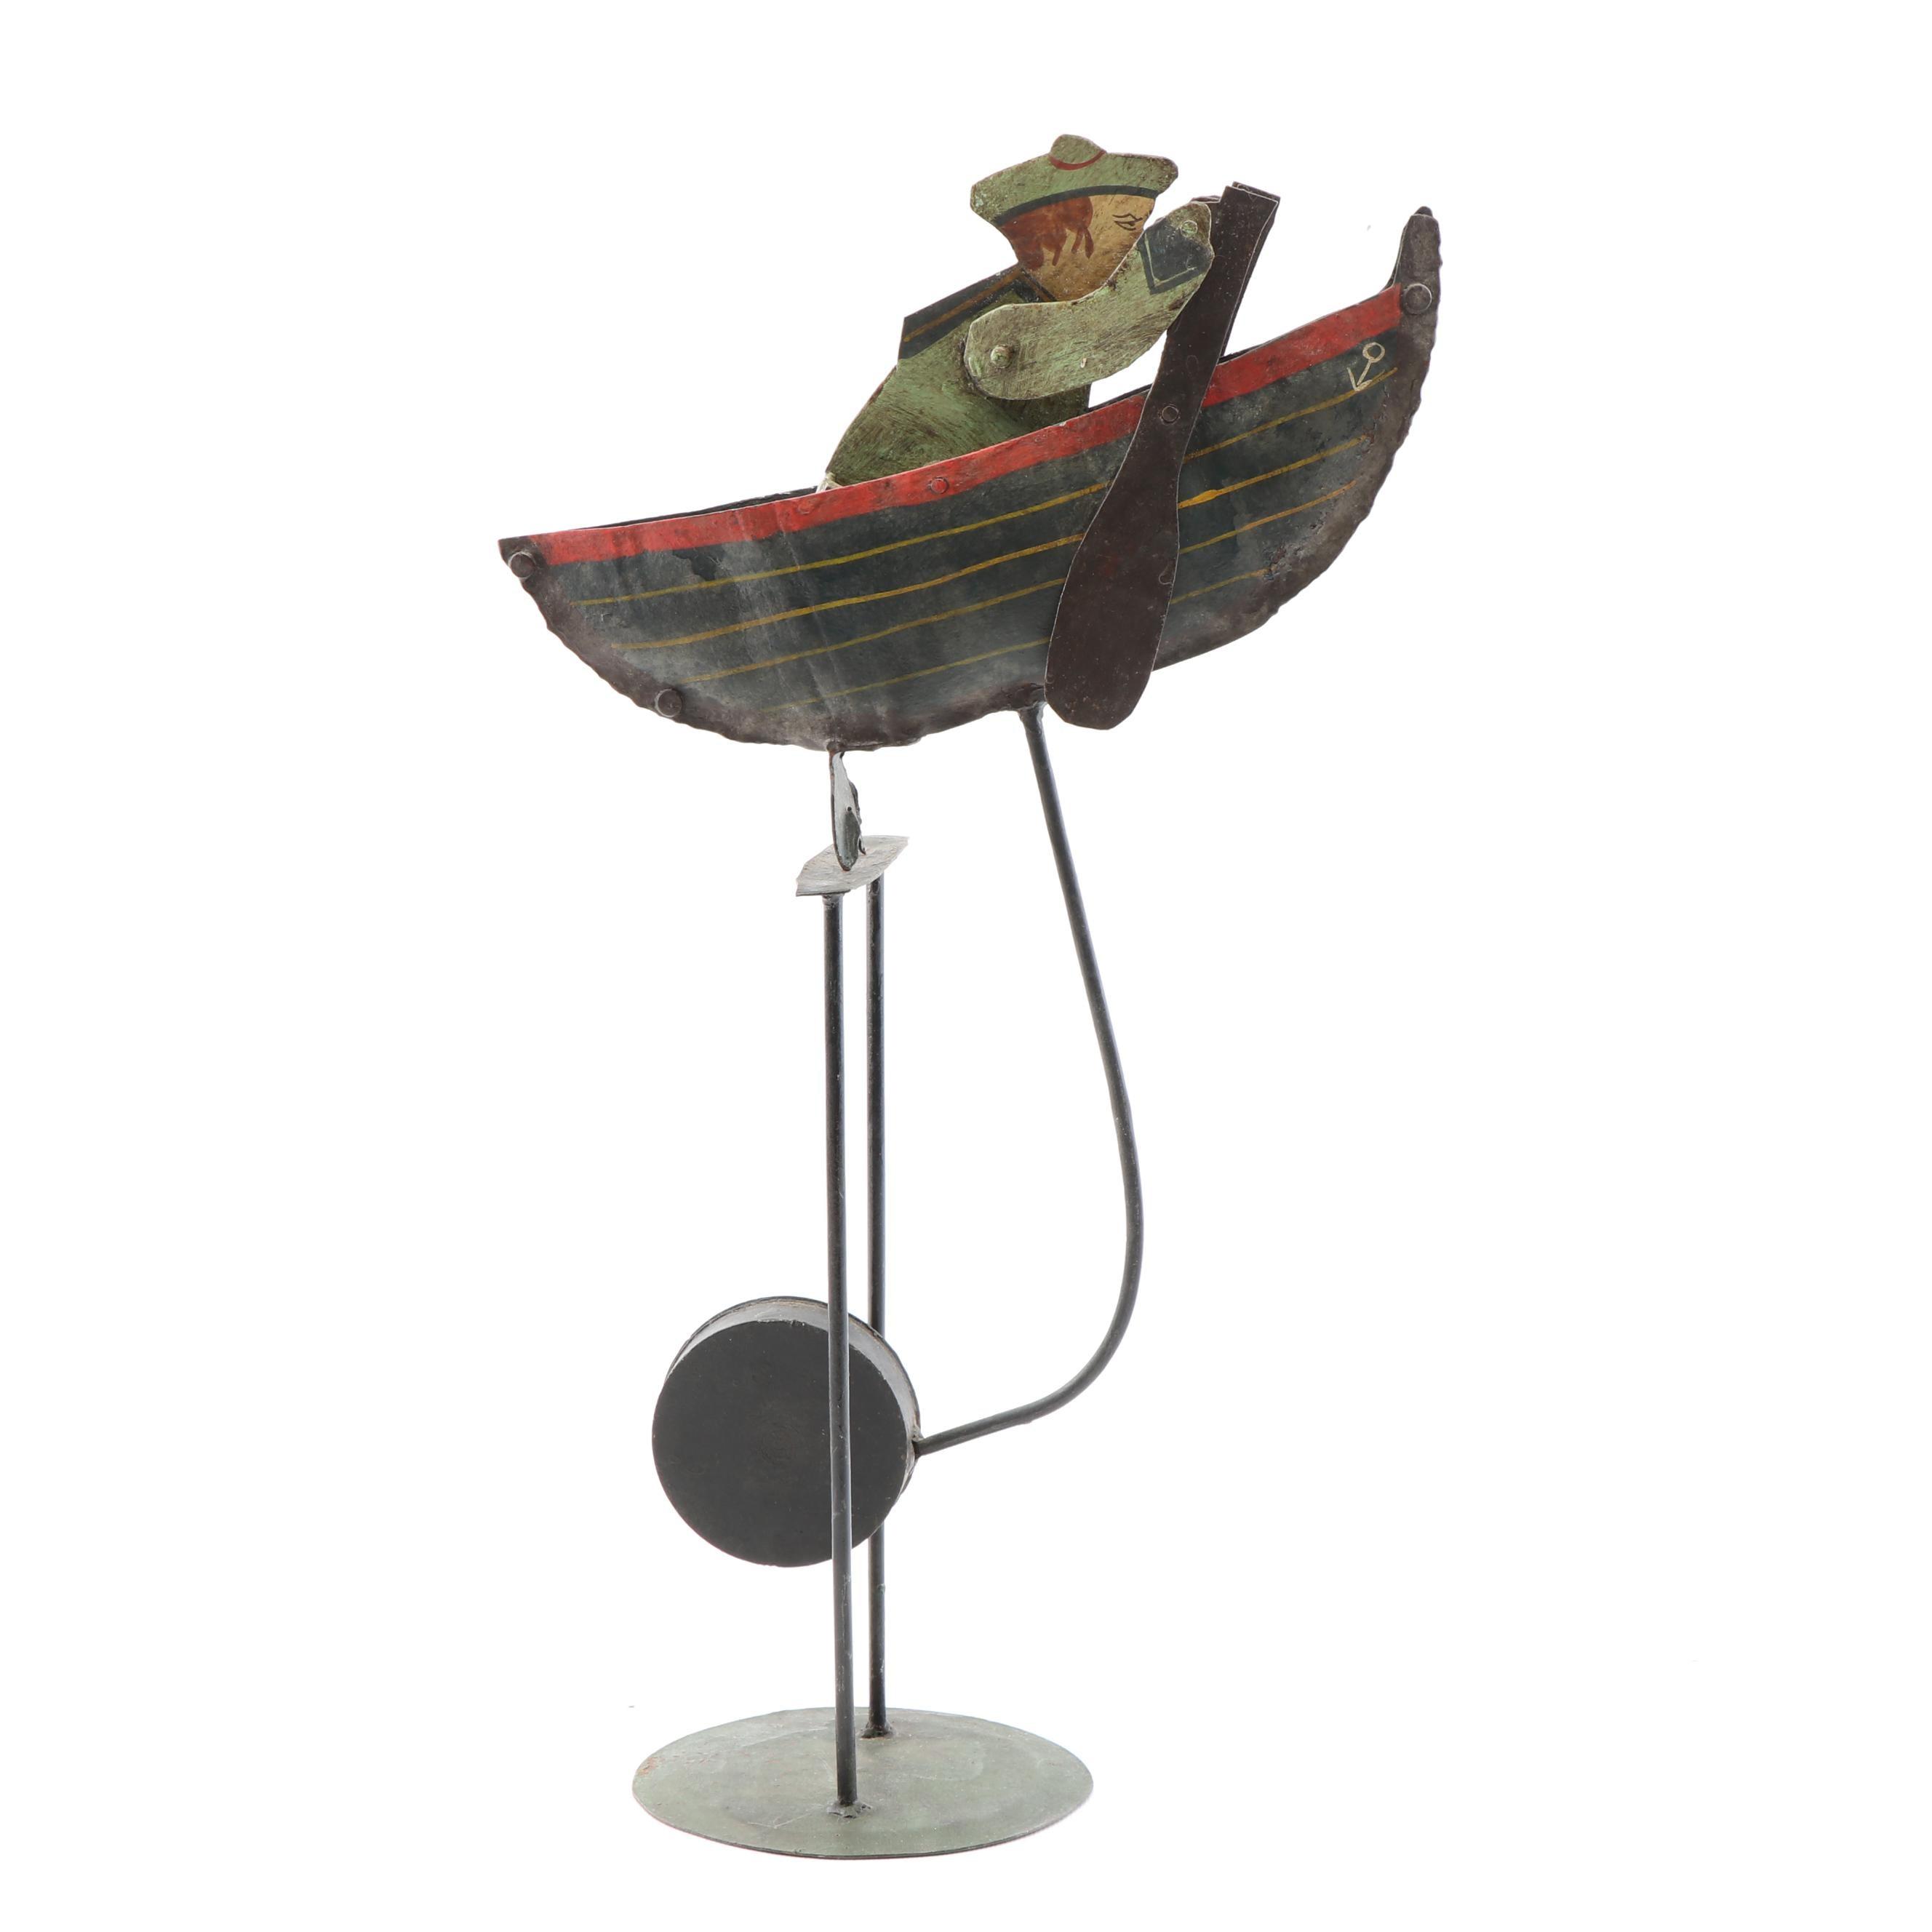 Metal Kinetic Sculpture of Sailor in Boat